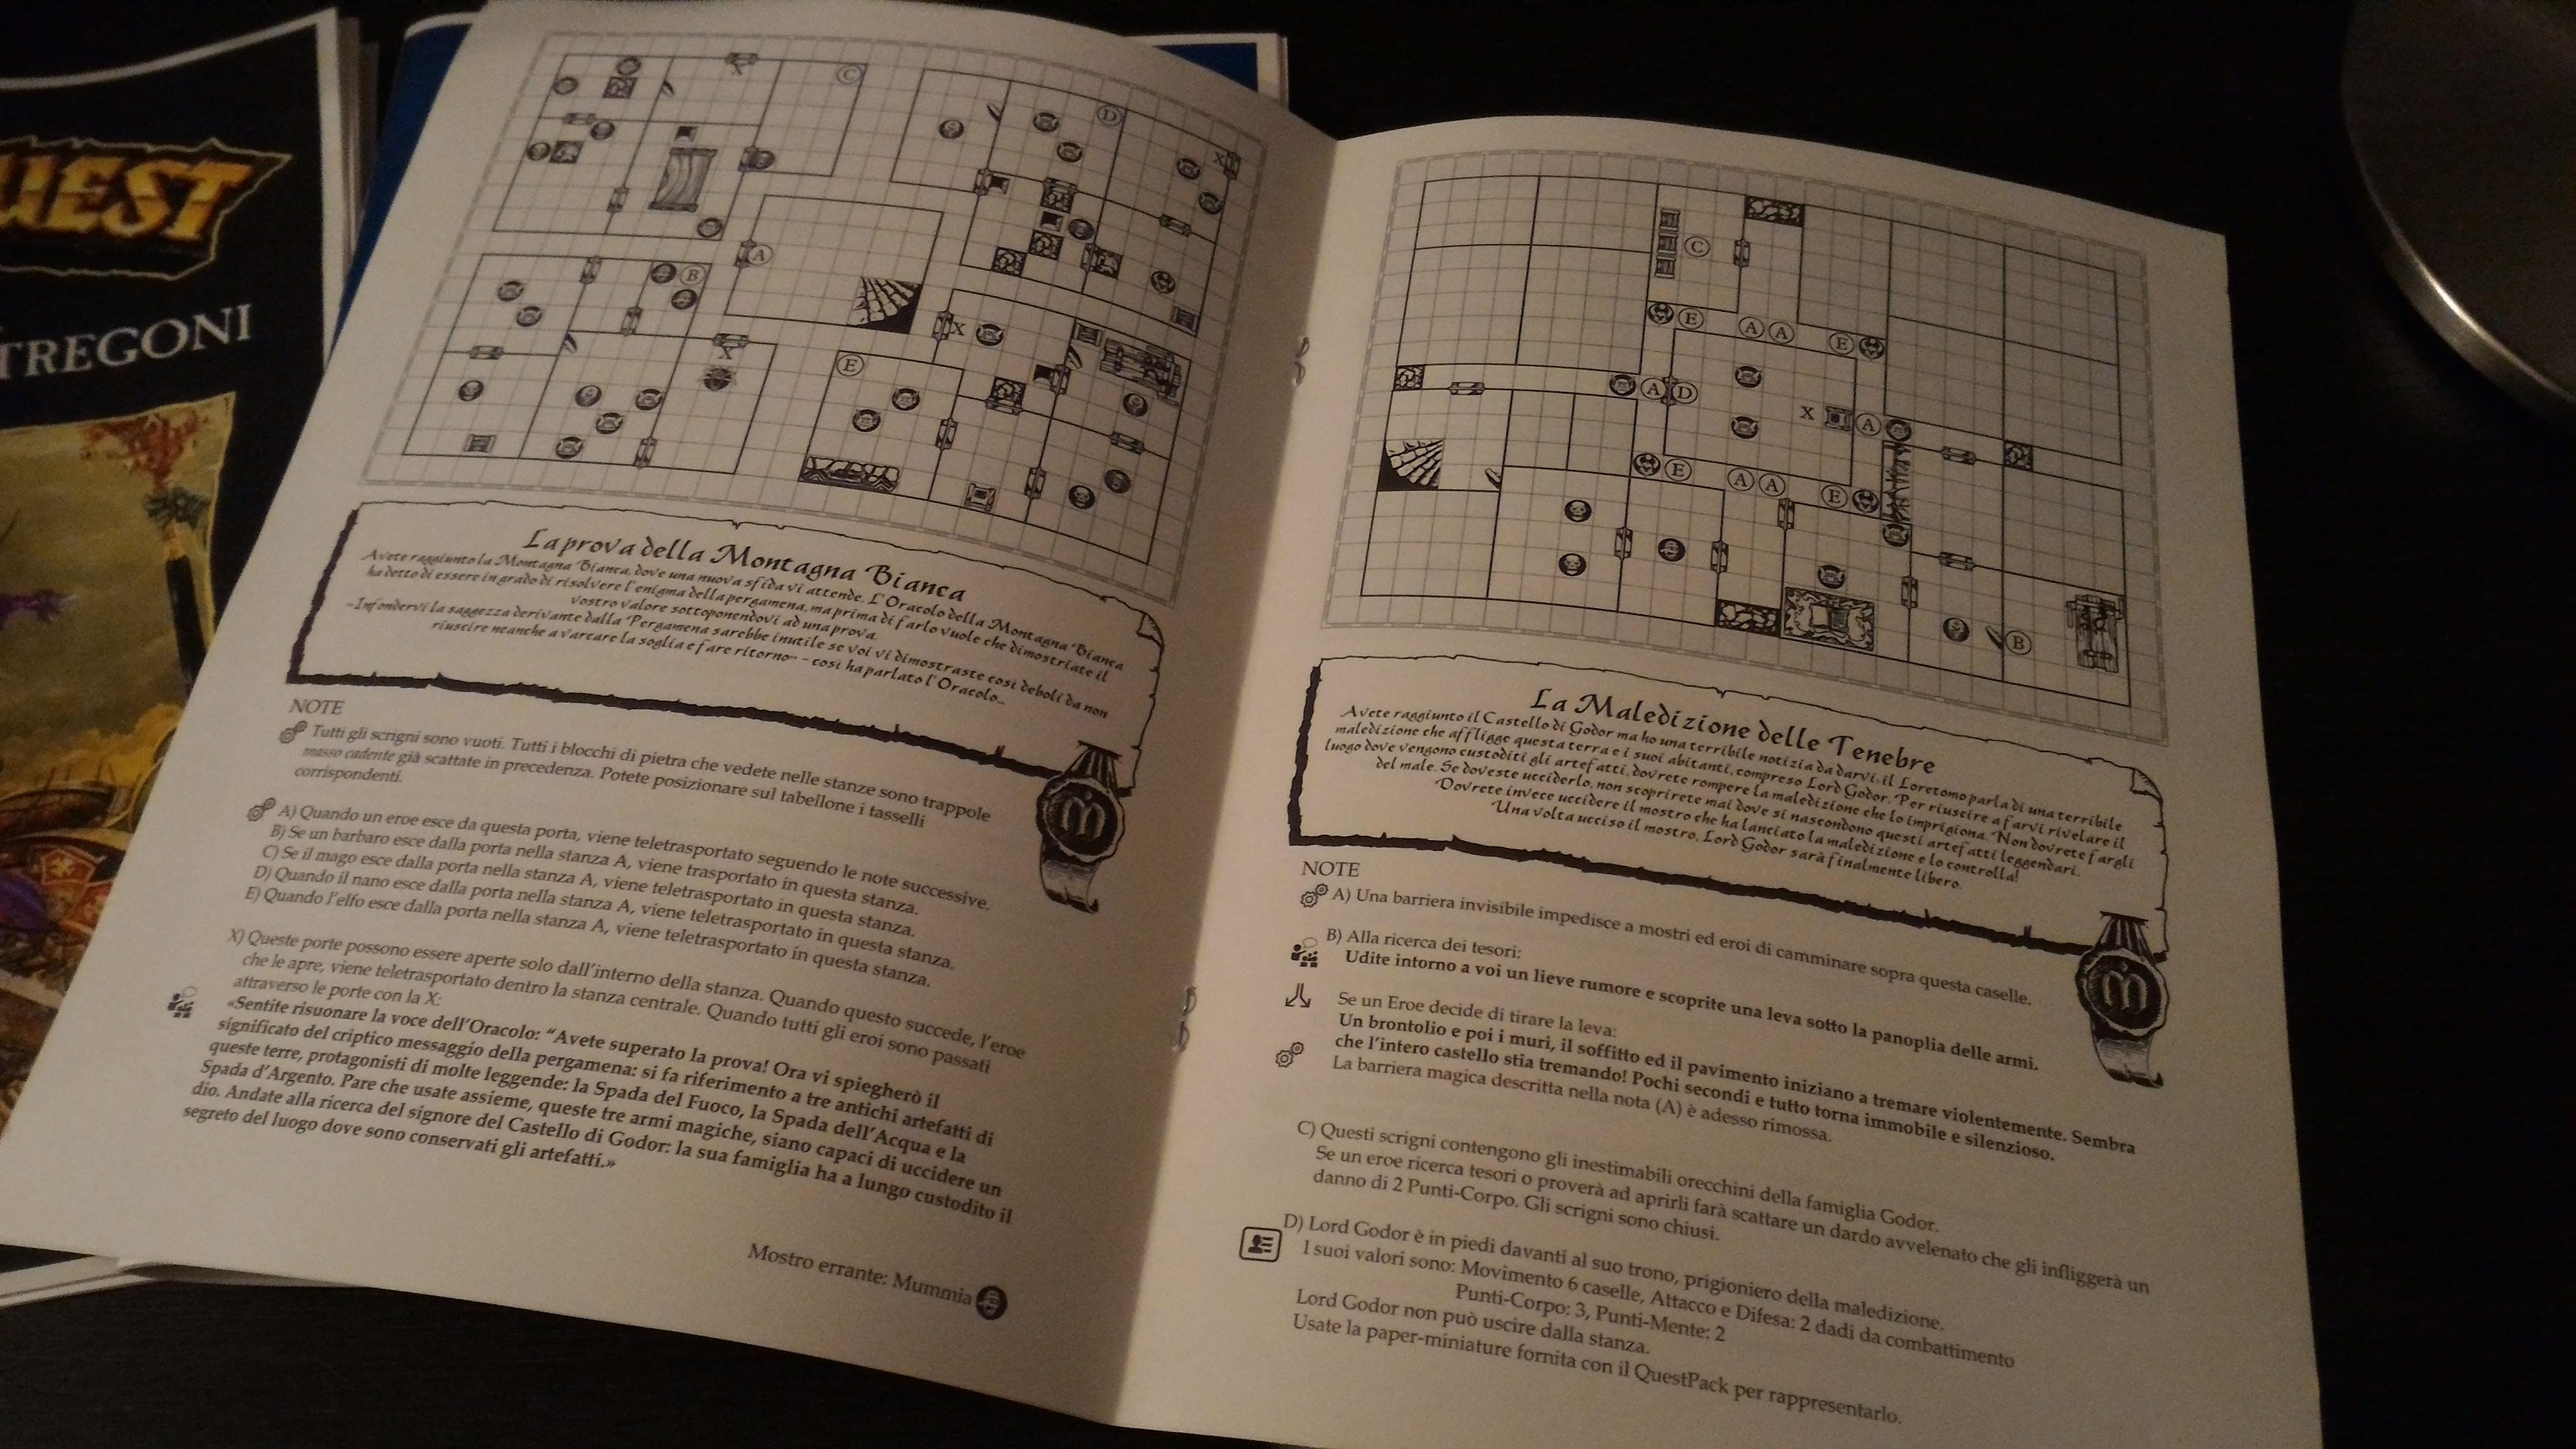 QuestBook-HeroQuest(5).jpg